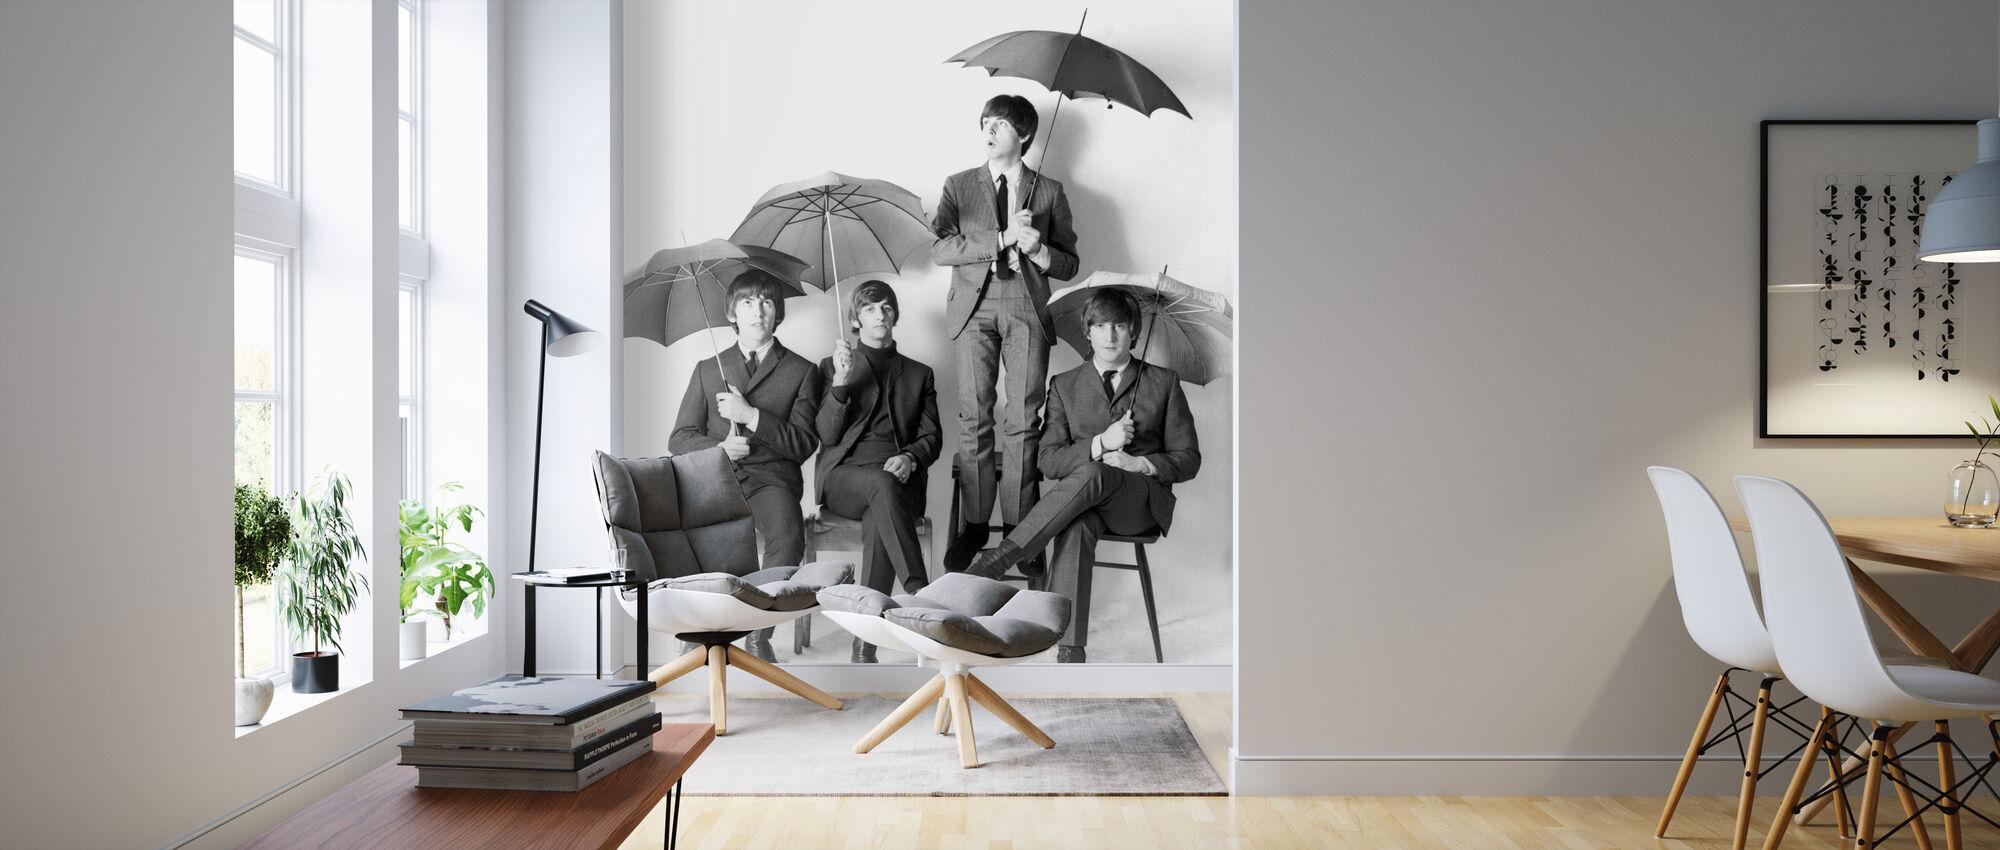 De Beatles - Paraplu's - Behang - Woonkamer